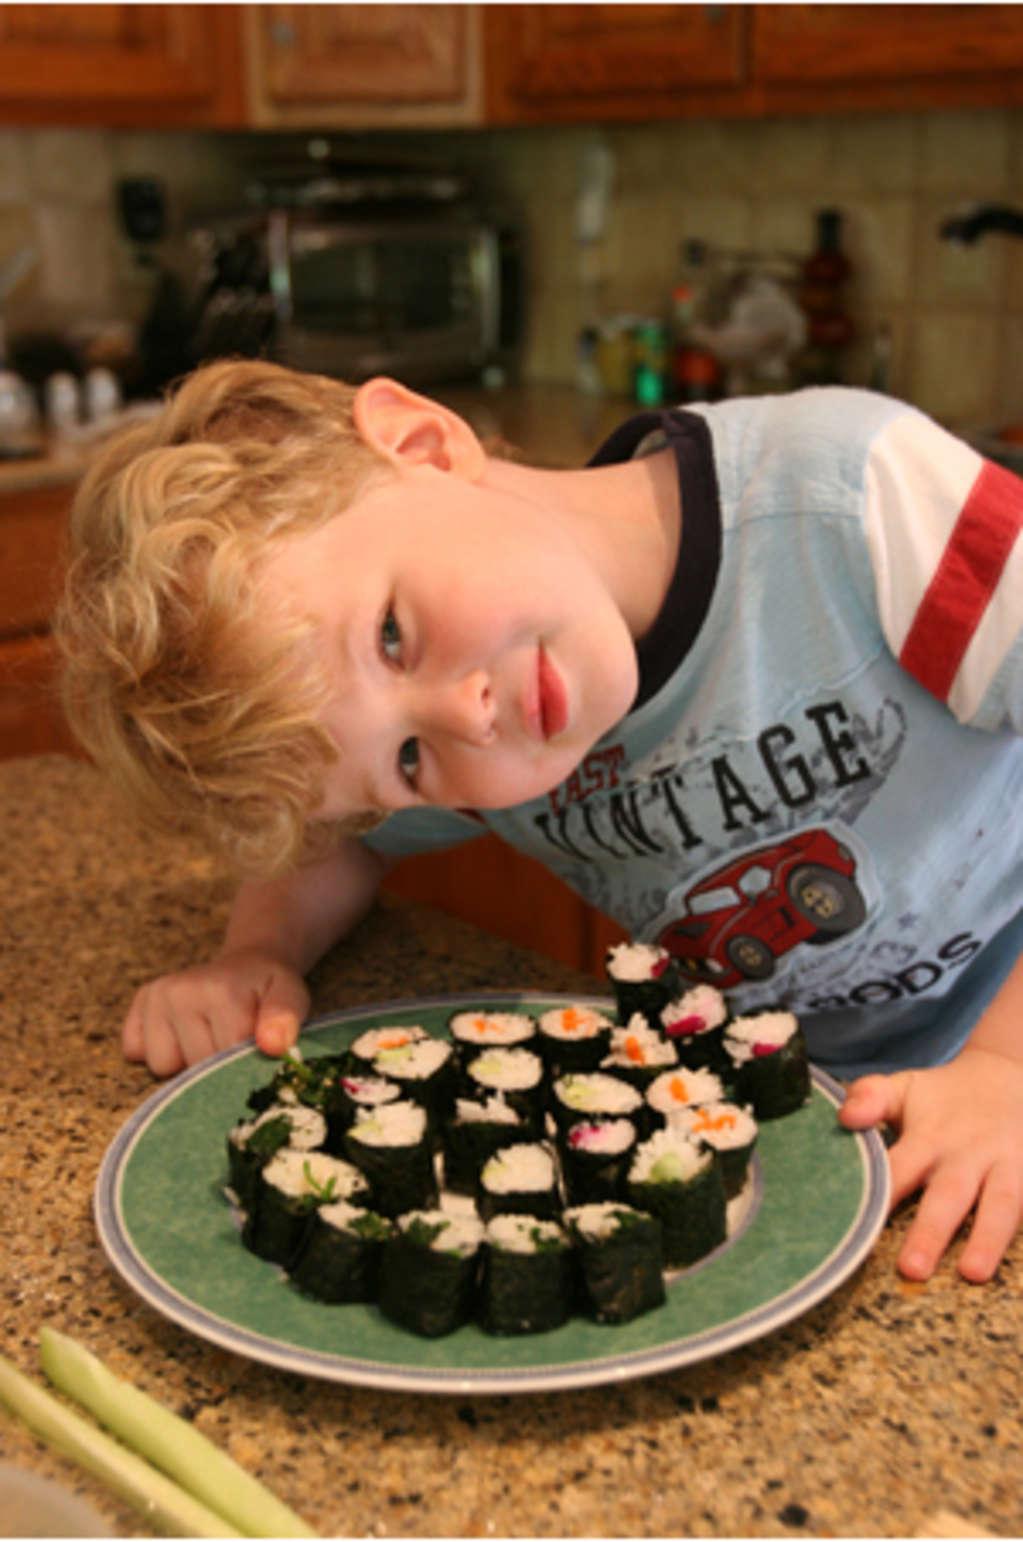 Summer Project: Make Vegetable Maki Sushi With Kids! | Kitchn